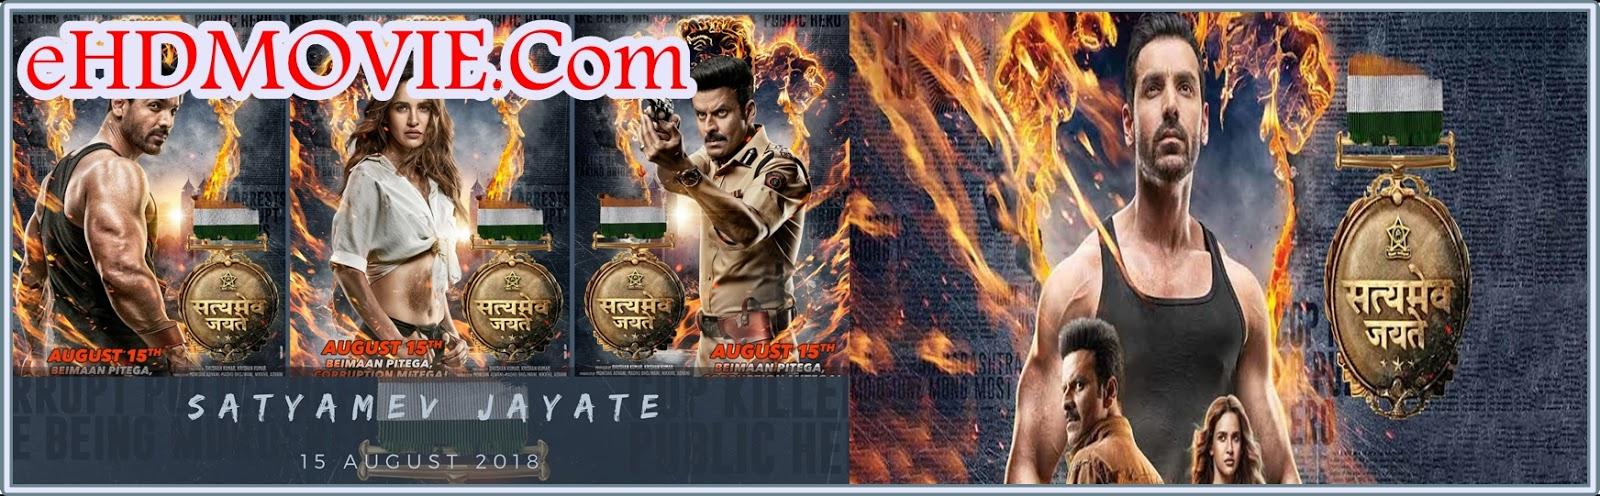 Satyameva Jayate 2018 Full Movie Hindi 1080p – 720p – HEVC – 480p ORG WEB-DL 200MB - 400MB – 650MB – 1.1GB – 3.2GB ESubs Free Download